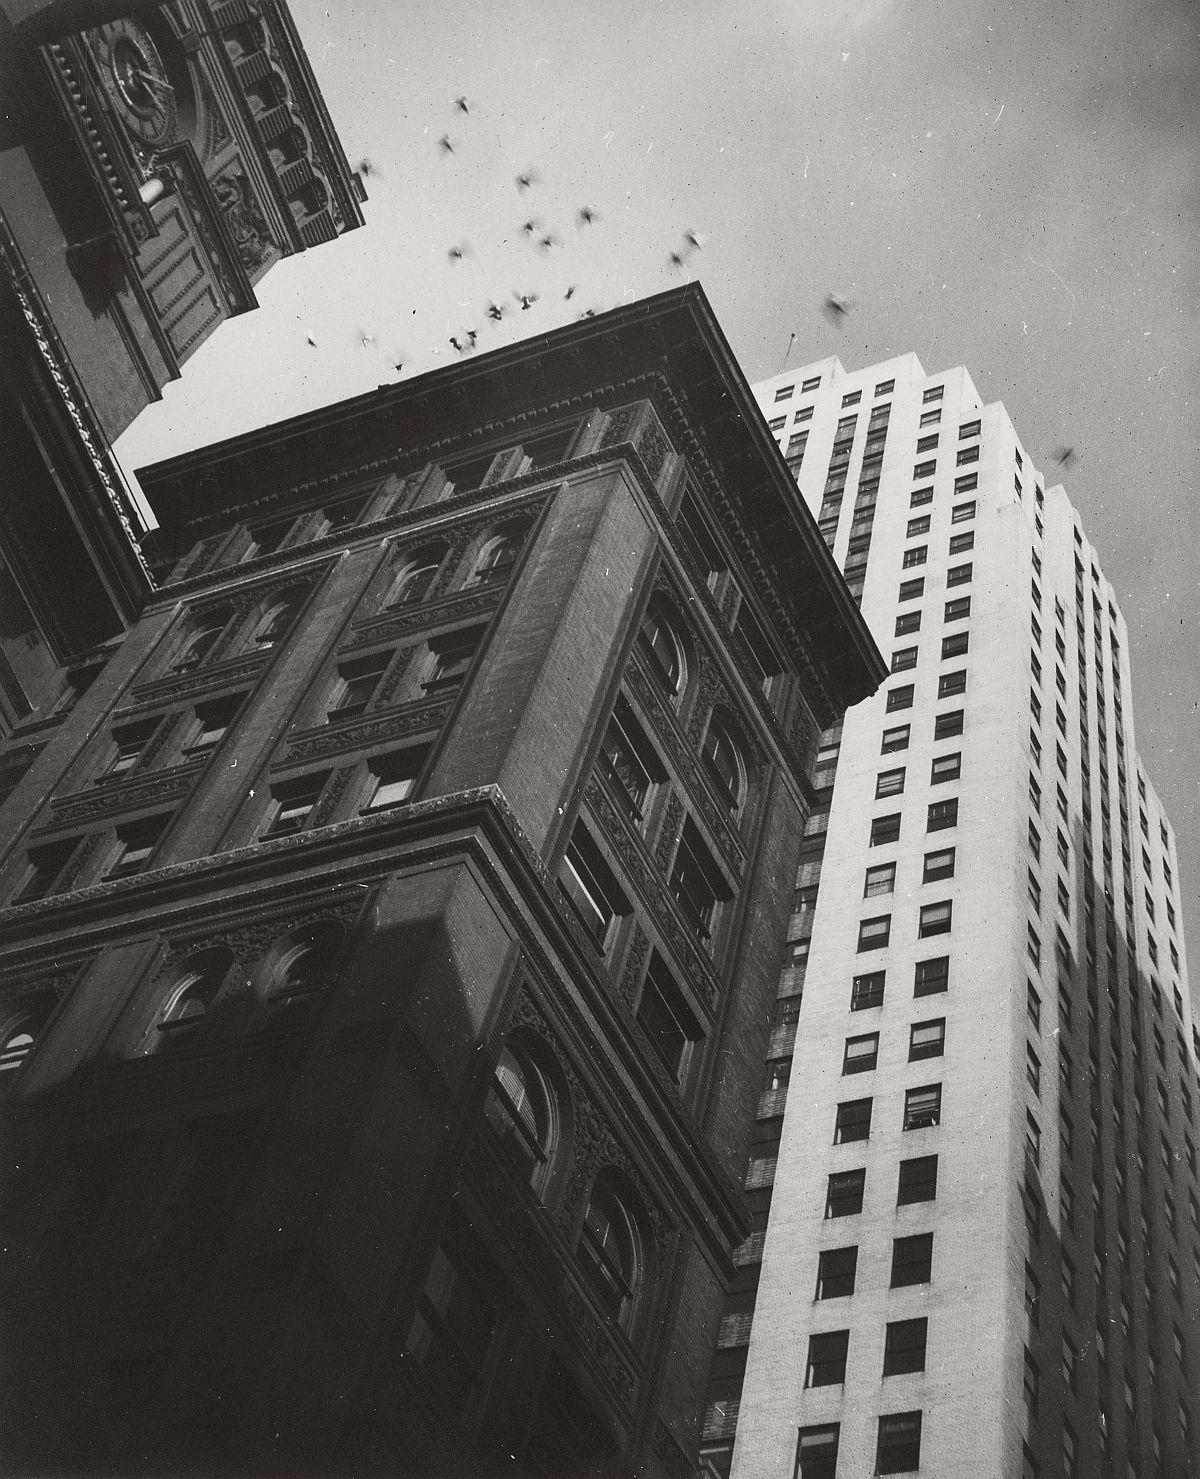 Robert Haas: New York City, 1940s © Wien Museum/Sammlung Robert Haas